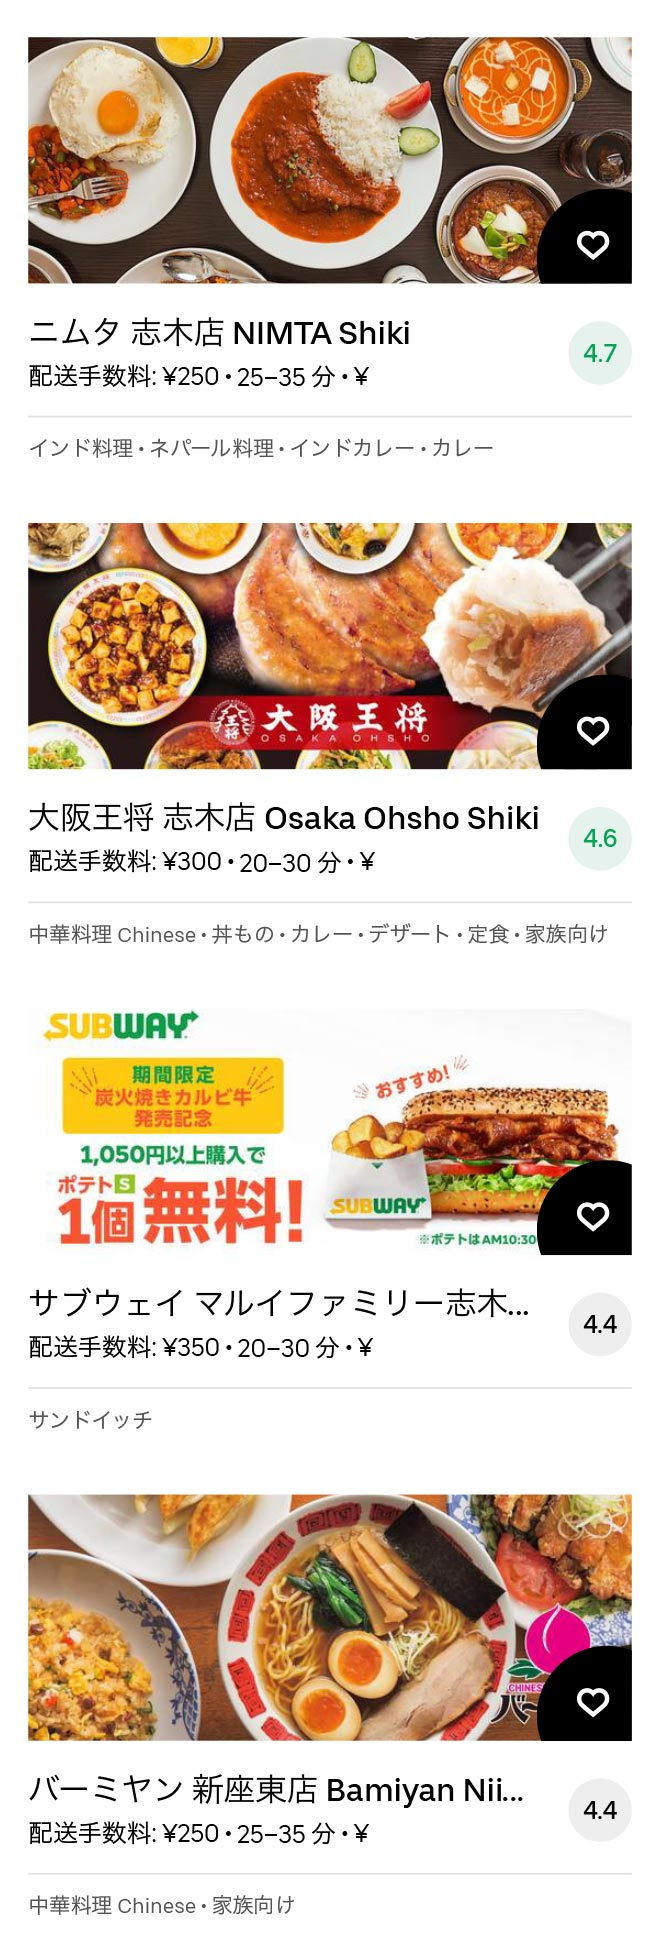 Niiza menu 2011 05